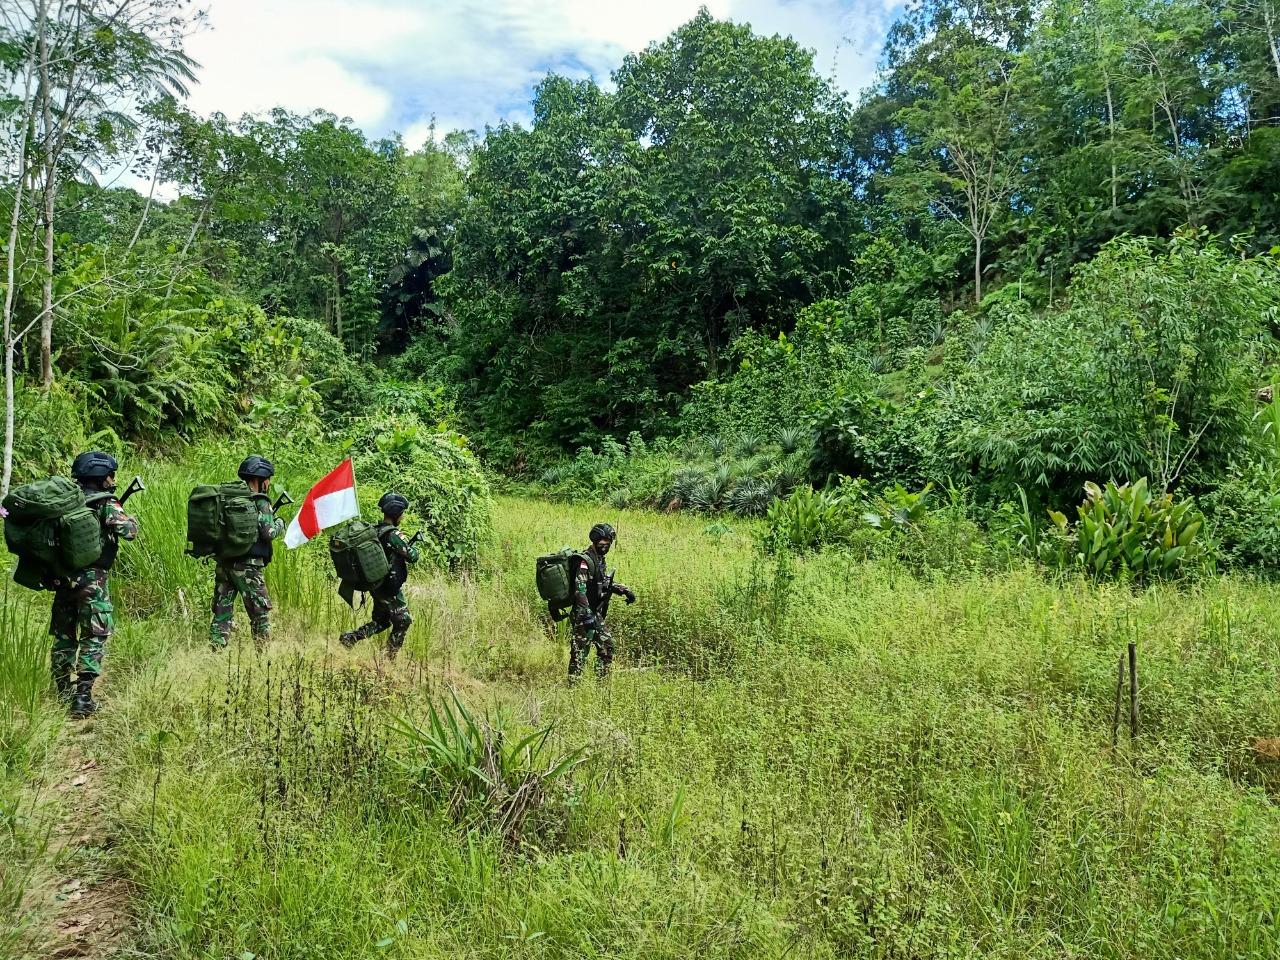 Satgas Pamtas RI-Malaysia Yonif Mekanis 643/Wns, Laksanakan Patroli Patok Batas di Wilayah Perbatasan antar Negara